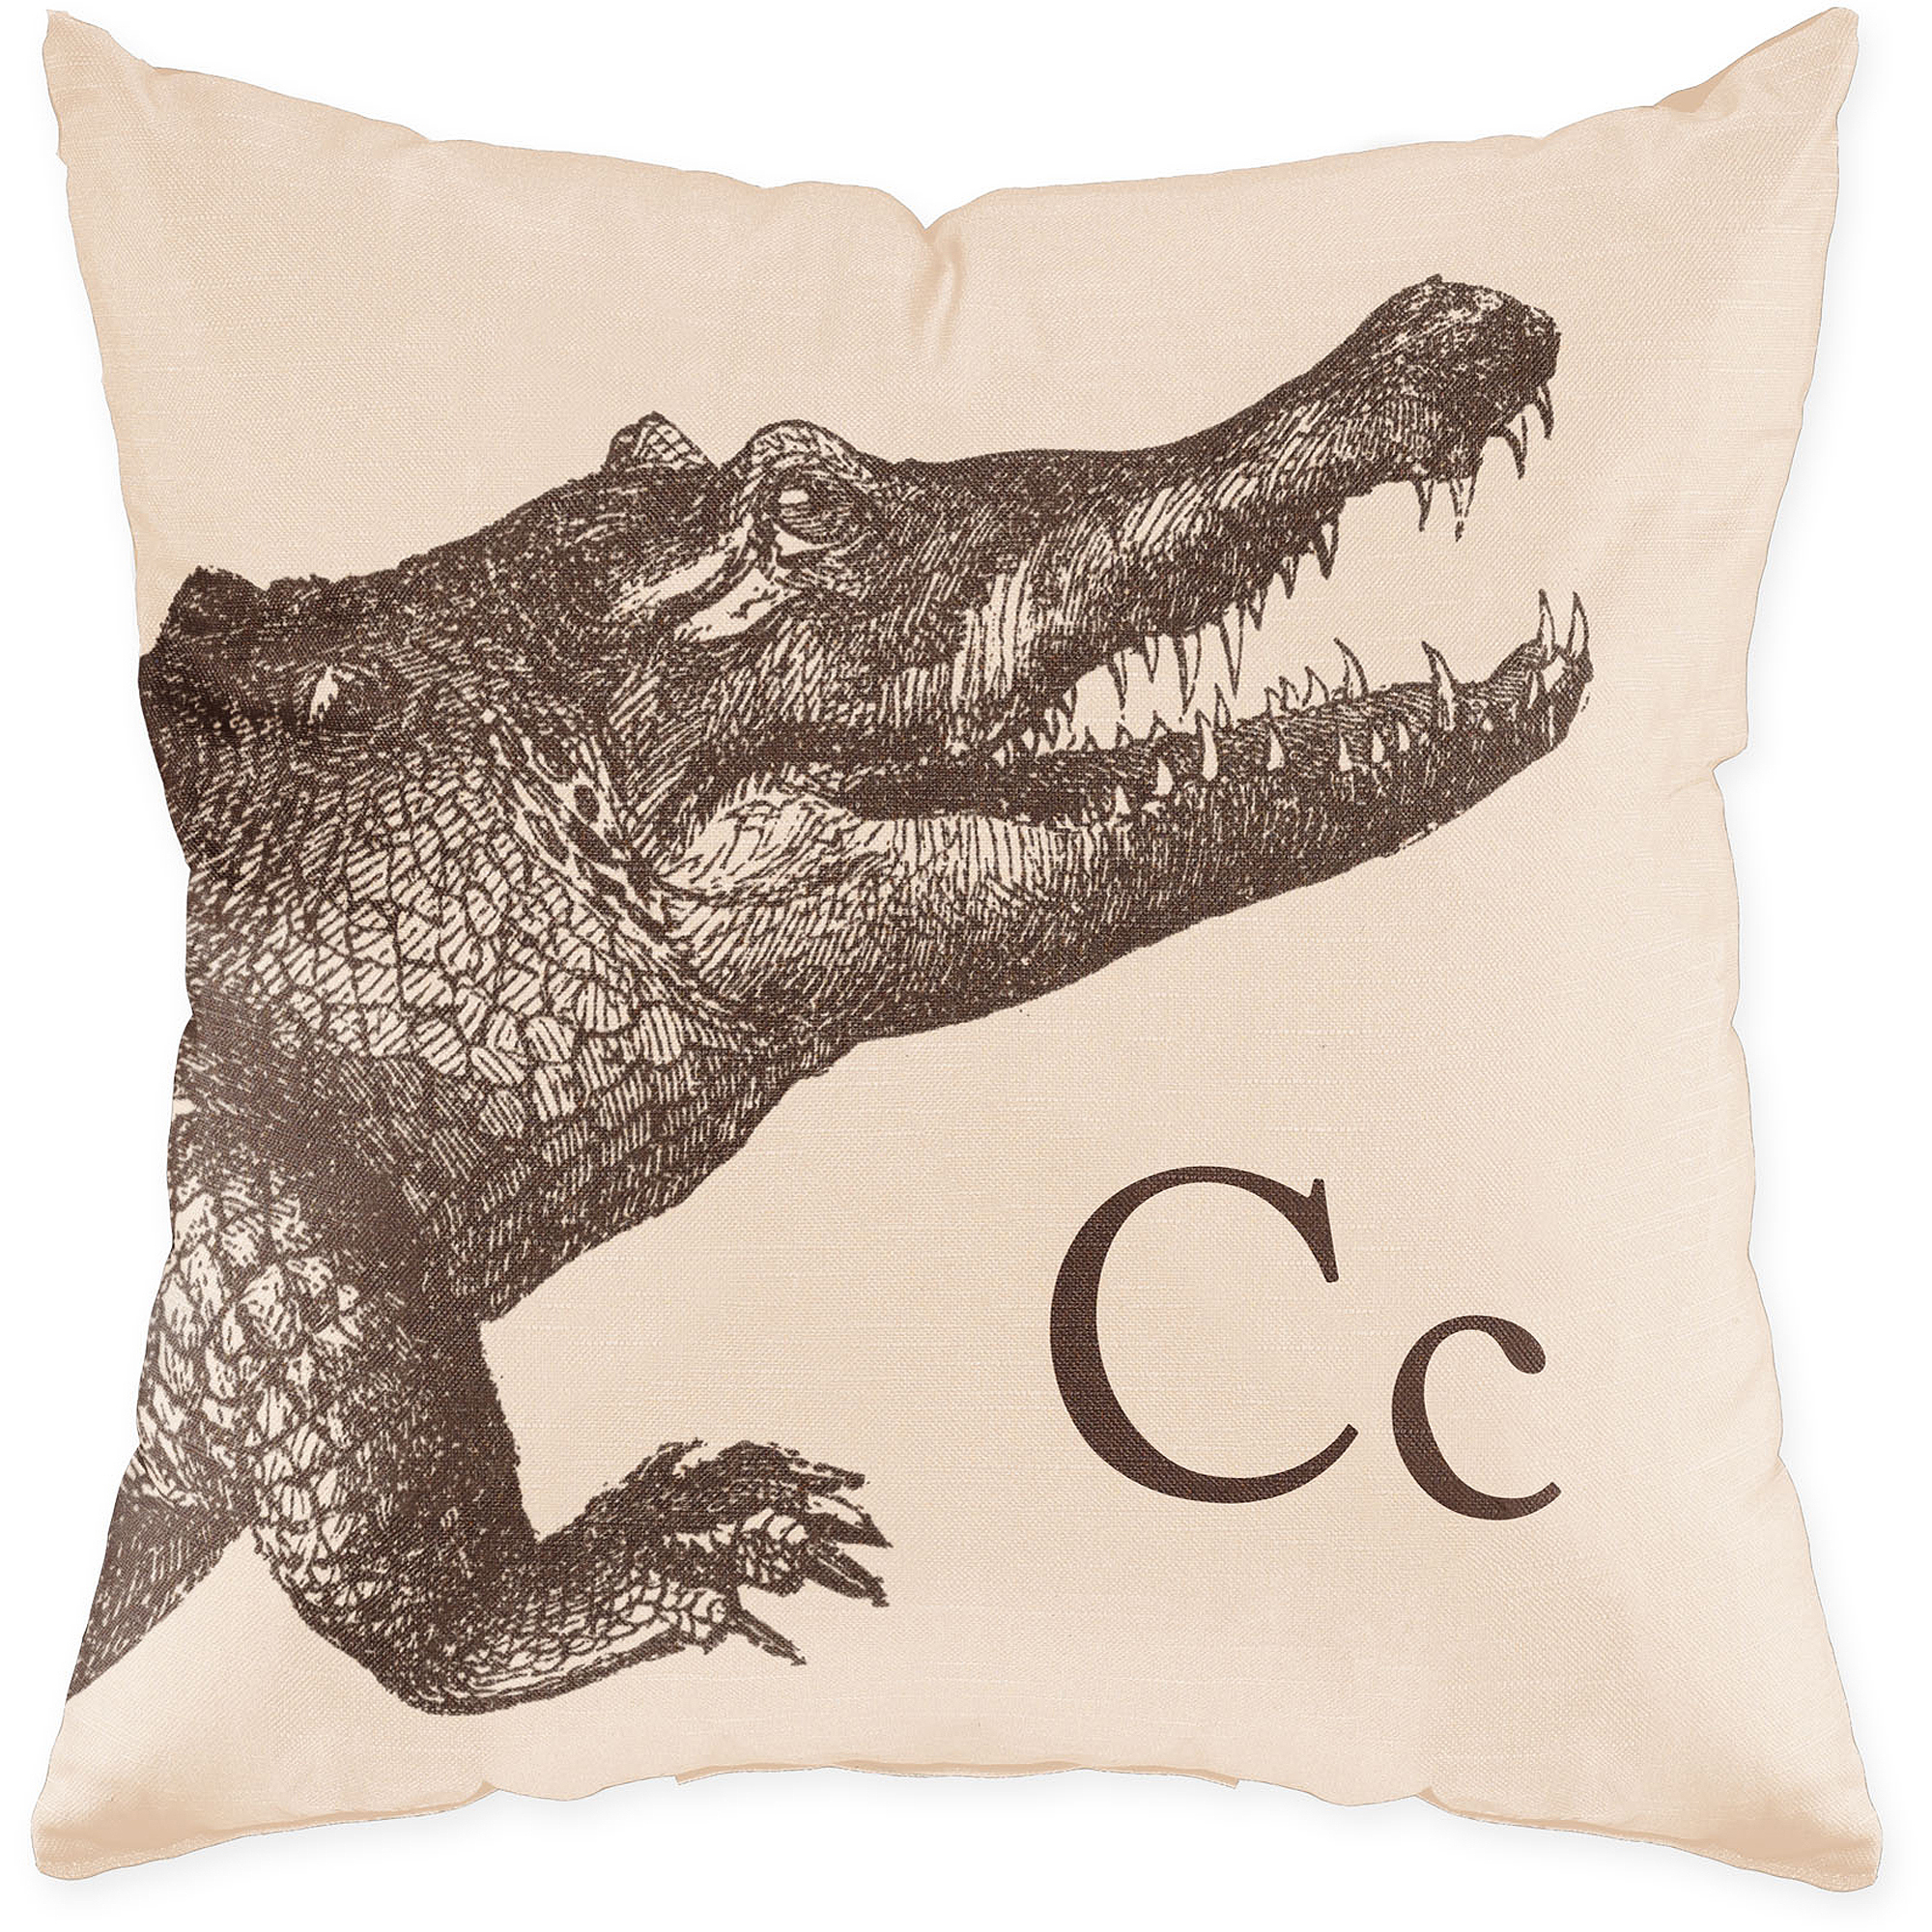 Checkerboard Lifestyle Crocodile Sand Throw Throw Pillow, Sand